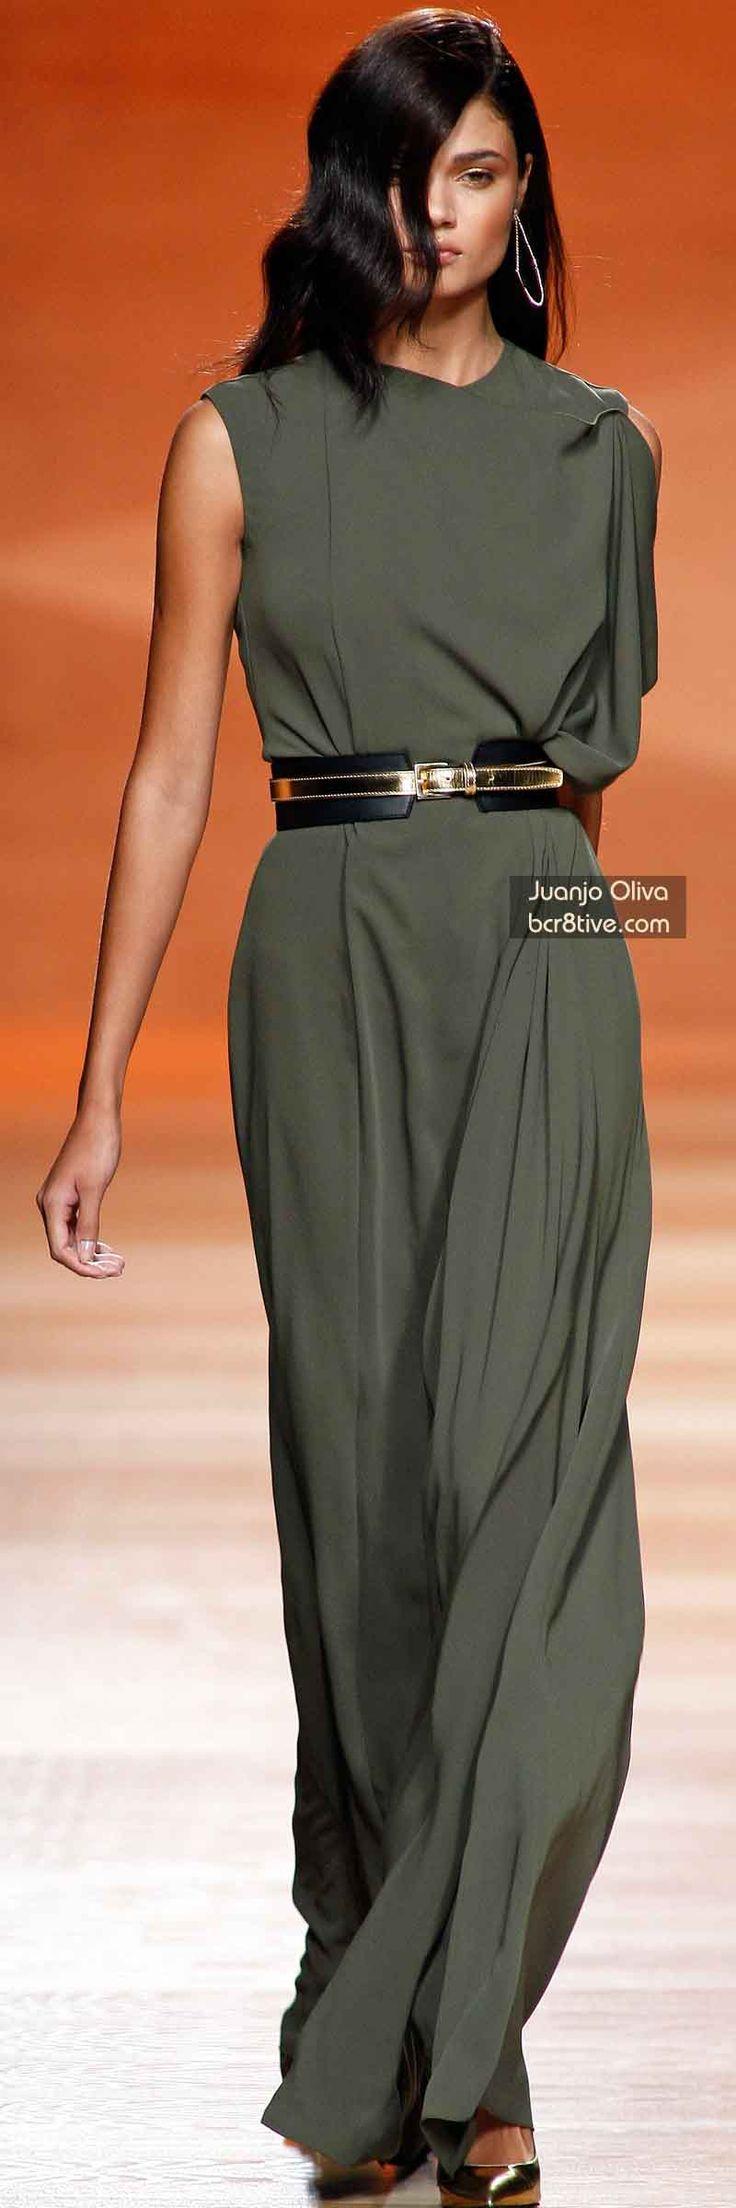 The Best Gowns of Fall 2014 Fashion Week International: Juano Oliva FW 2014 #MadridFashionWeek